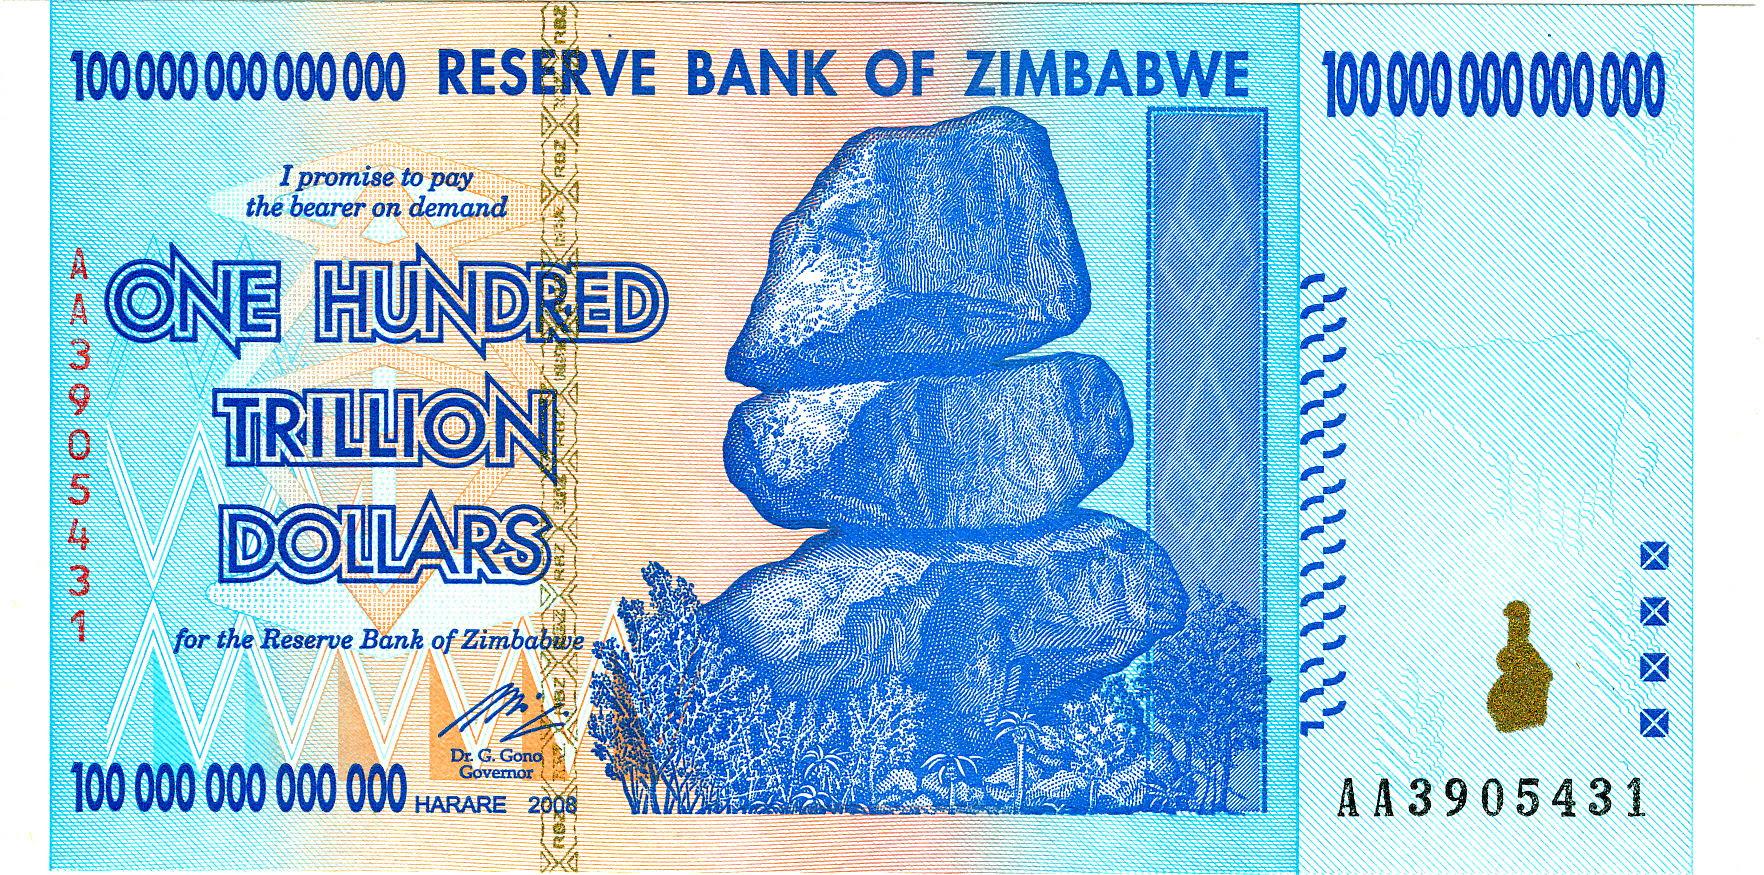 Zimbabwe $100 trillion, 2008 hyperinflation banknote